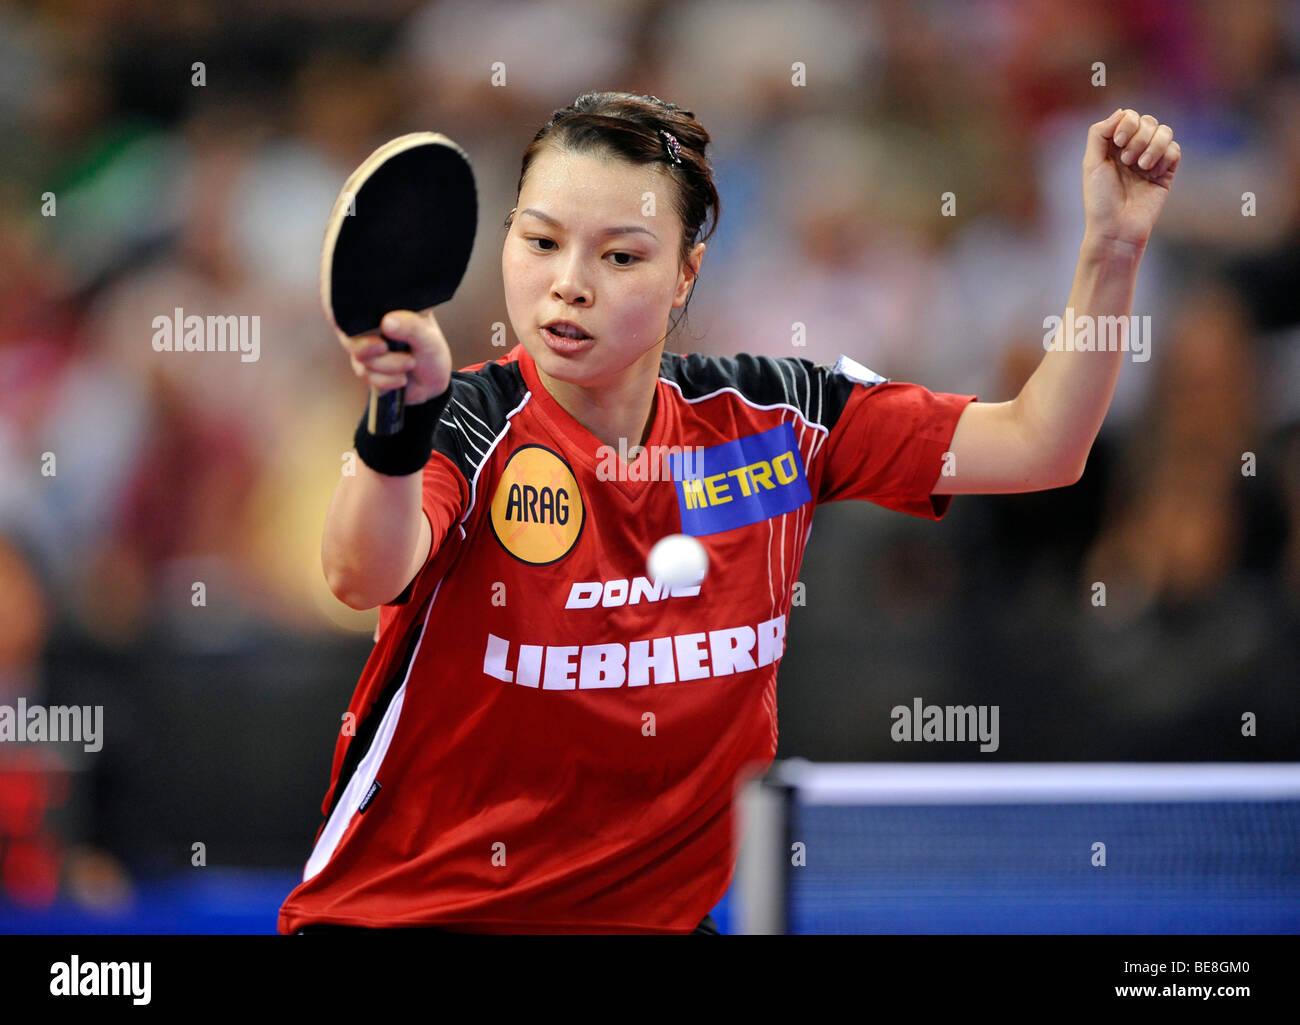 WU Jiaduo campeón de Europa, Alemania, tenis de mesa EM 2009, Porsche-Arena, Stuttgart, Baden-Wurtemberg, Alemania, Imagen De Stock